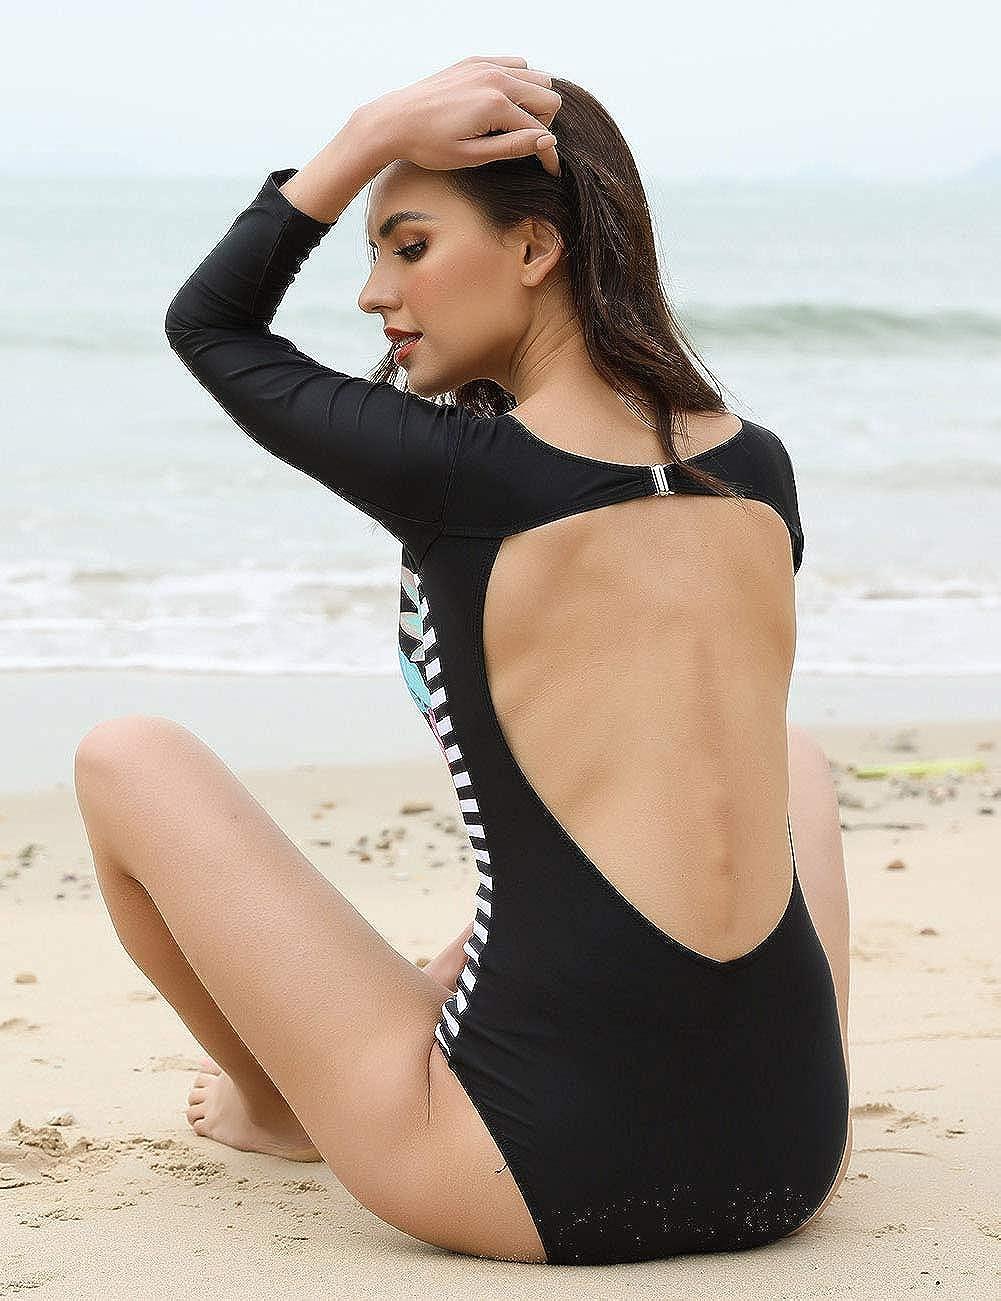 JOYMODE Womens Rashguard Swimsuit Print Surfing Bathing Suits Long Sleeve Swimwear Size M-5XL